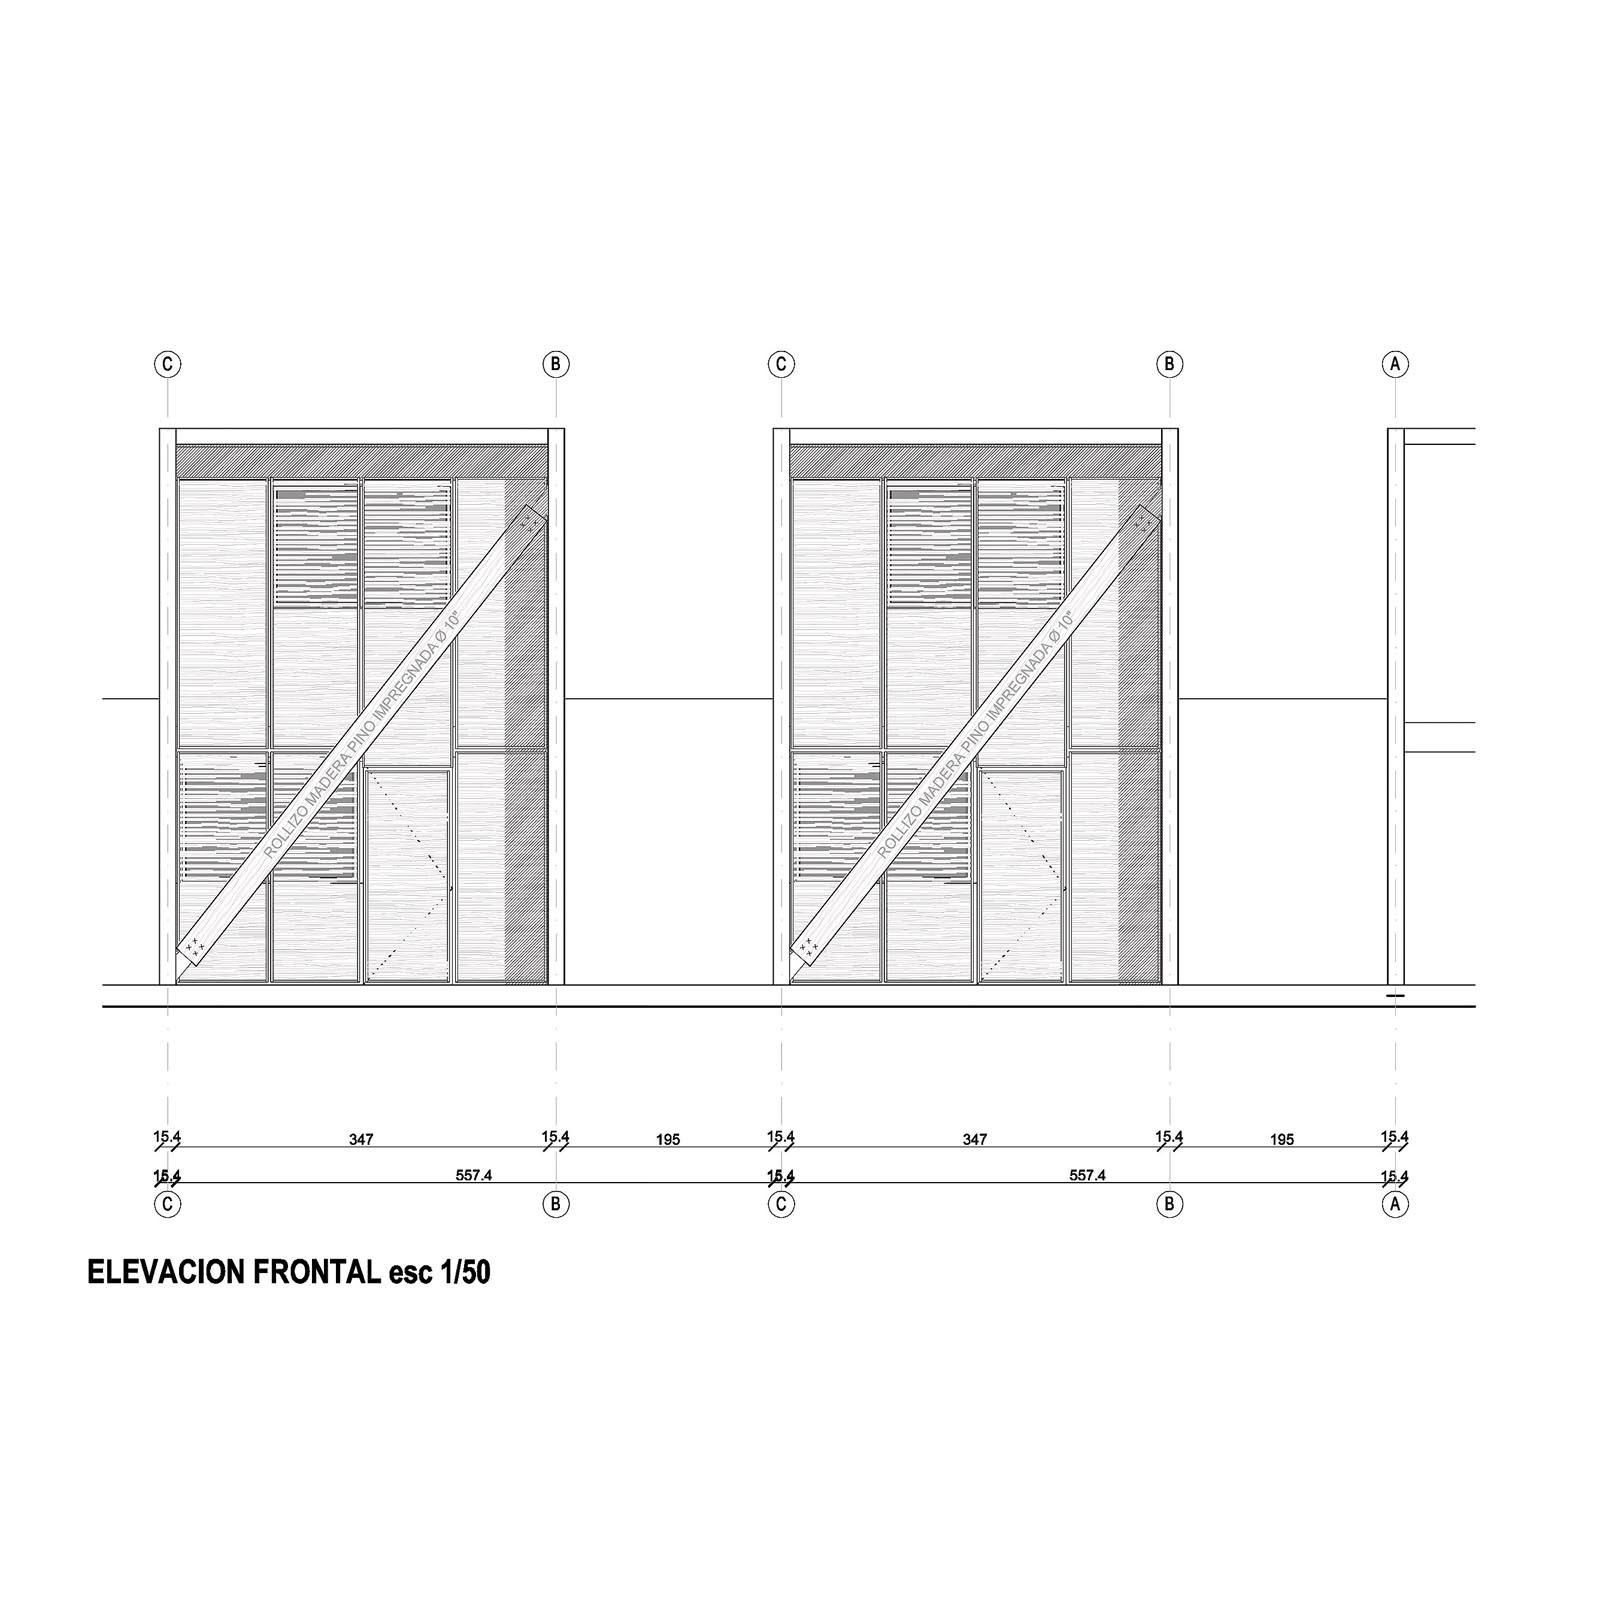 29-02__06__Elev-Frontal_WEB-RESIZE_cuadrada